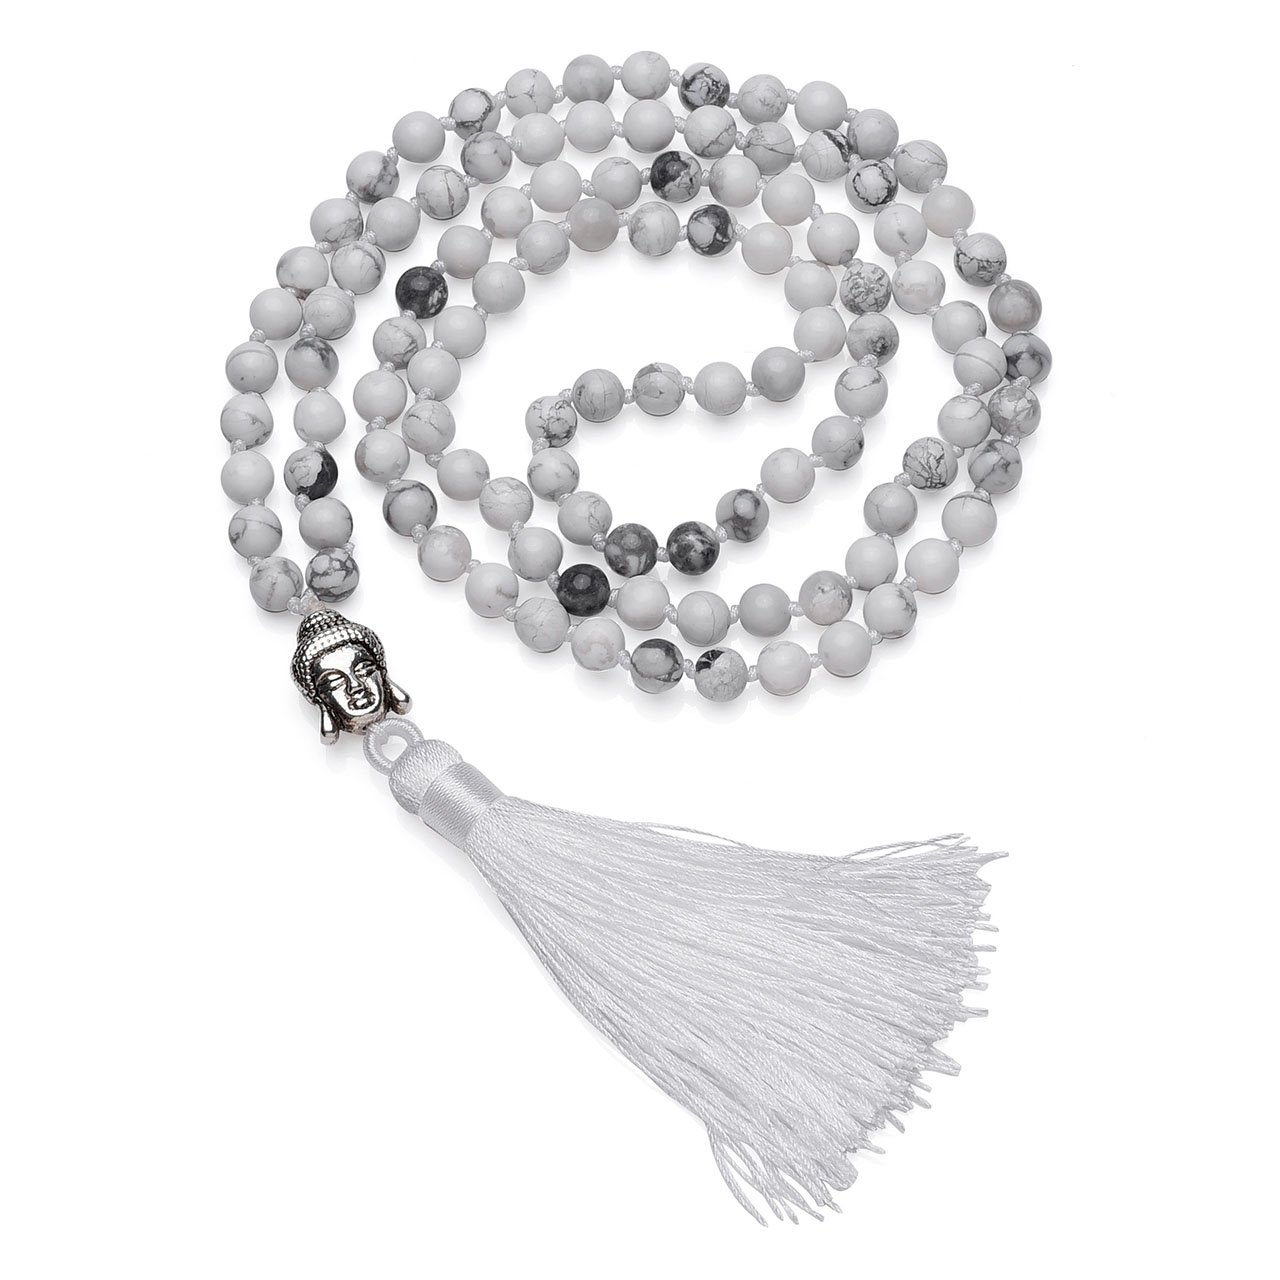 Top Plaza 108 Buddhist Prayer Mala Tibetan Beads Chakra Healing Crystals Yoga Medittion Multilayer Wrap Bracelet Necklace 6MM Gemstone W/Buddha Tassel Chram(White Turquoise)